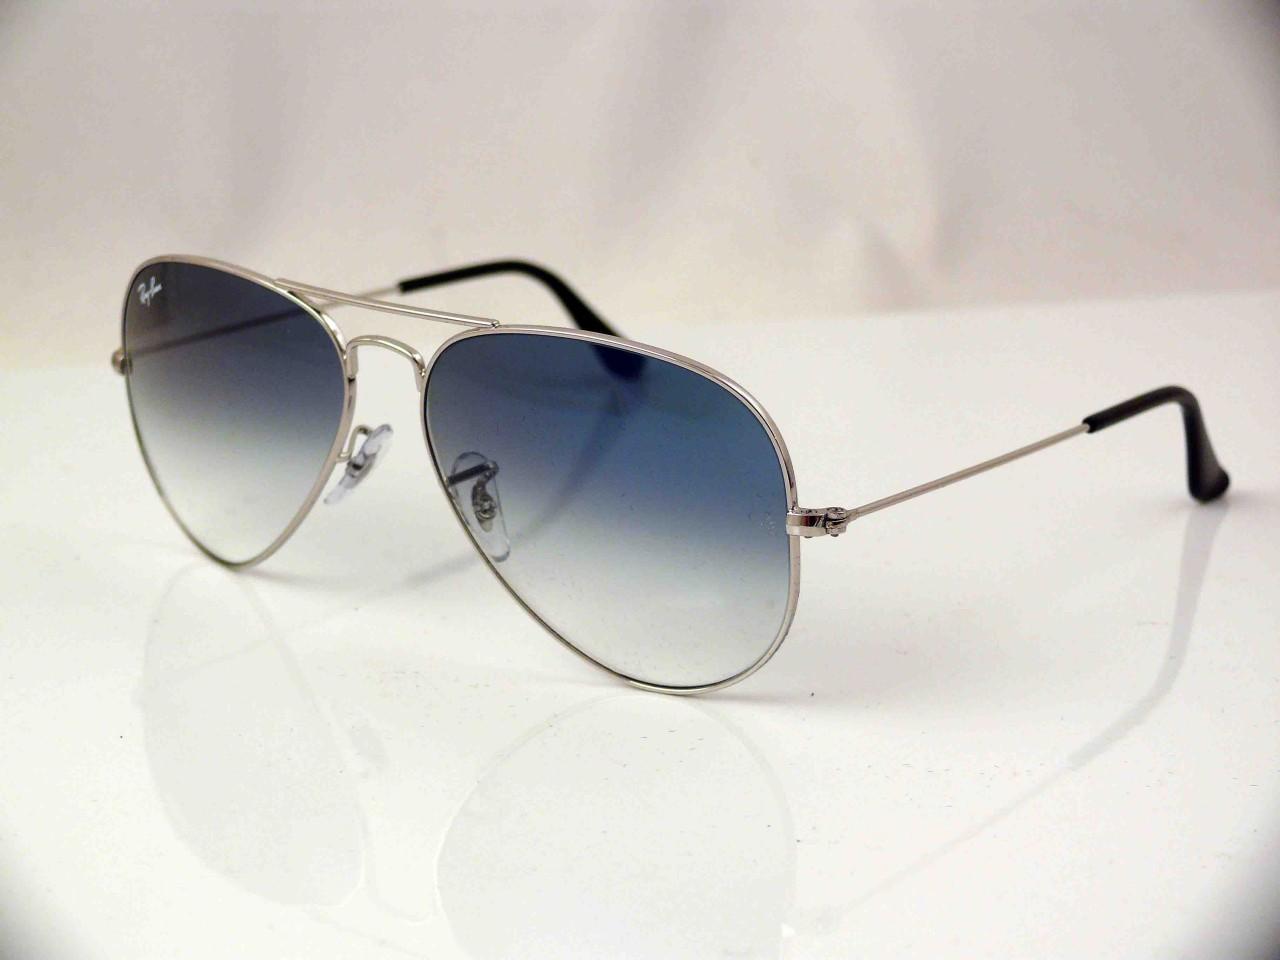 Ray Ban Large Frame Glasses : RAY BAN LARGE METAL AVIATOR SUNGLASSES SILVER FRAME LIGHT ...